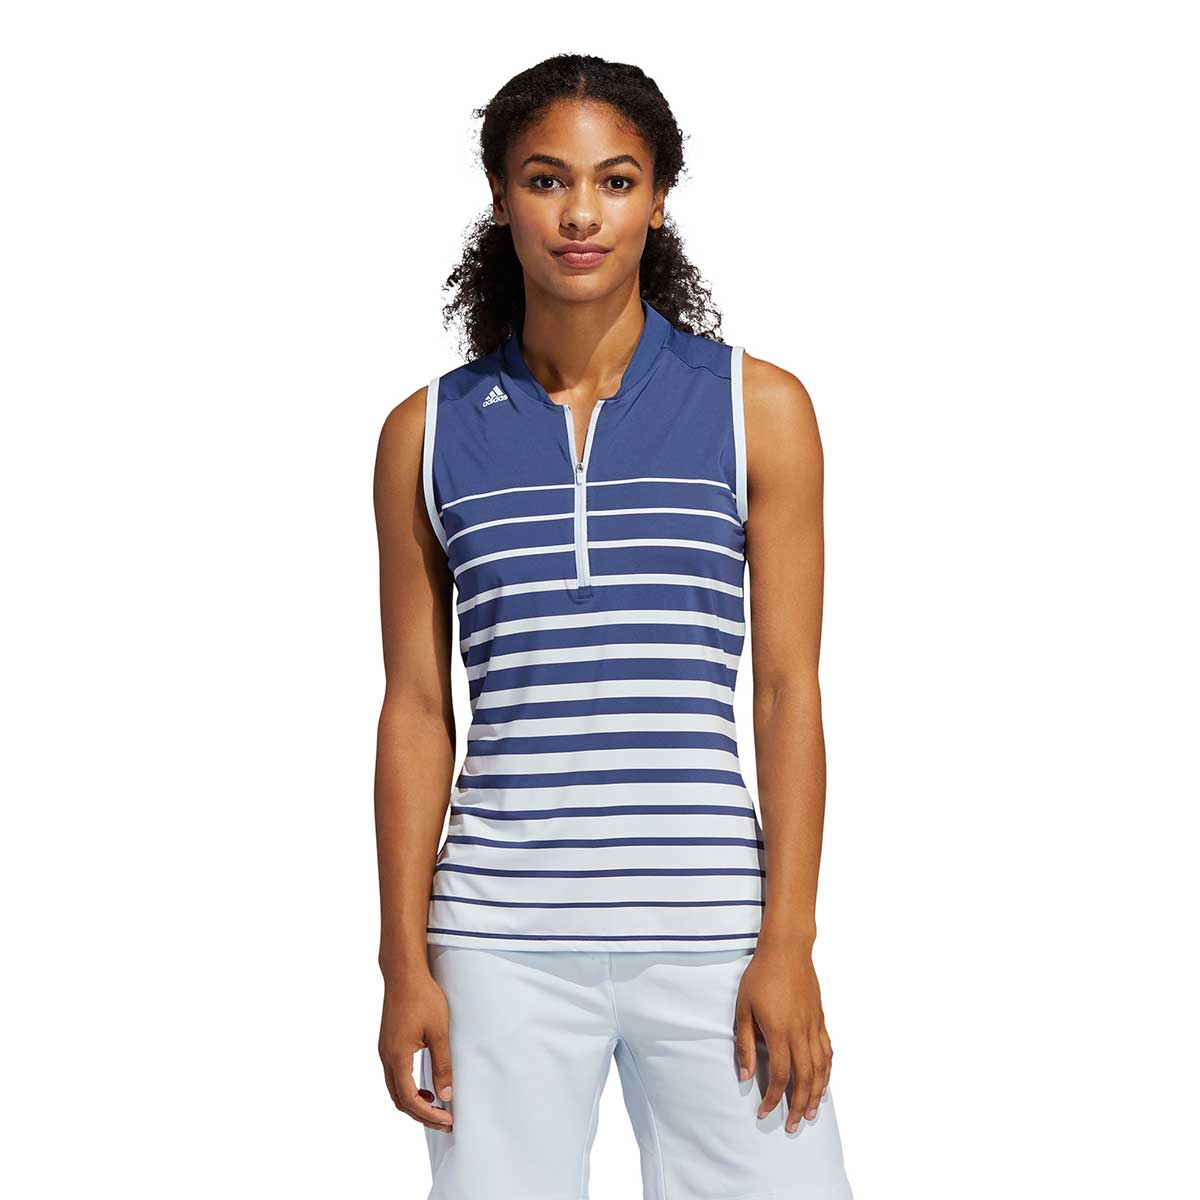 Adidas Women's Engineered Stripe Sleeveless Tech Indigo Polo